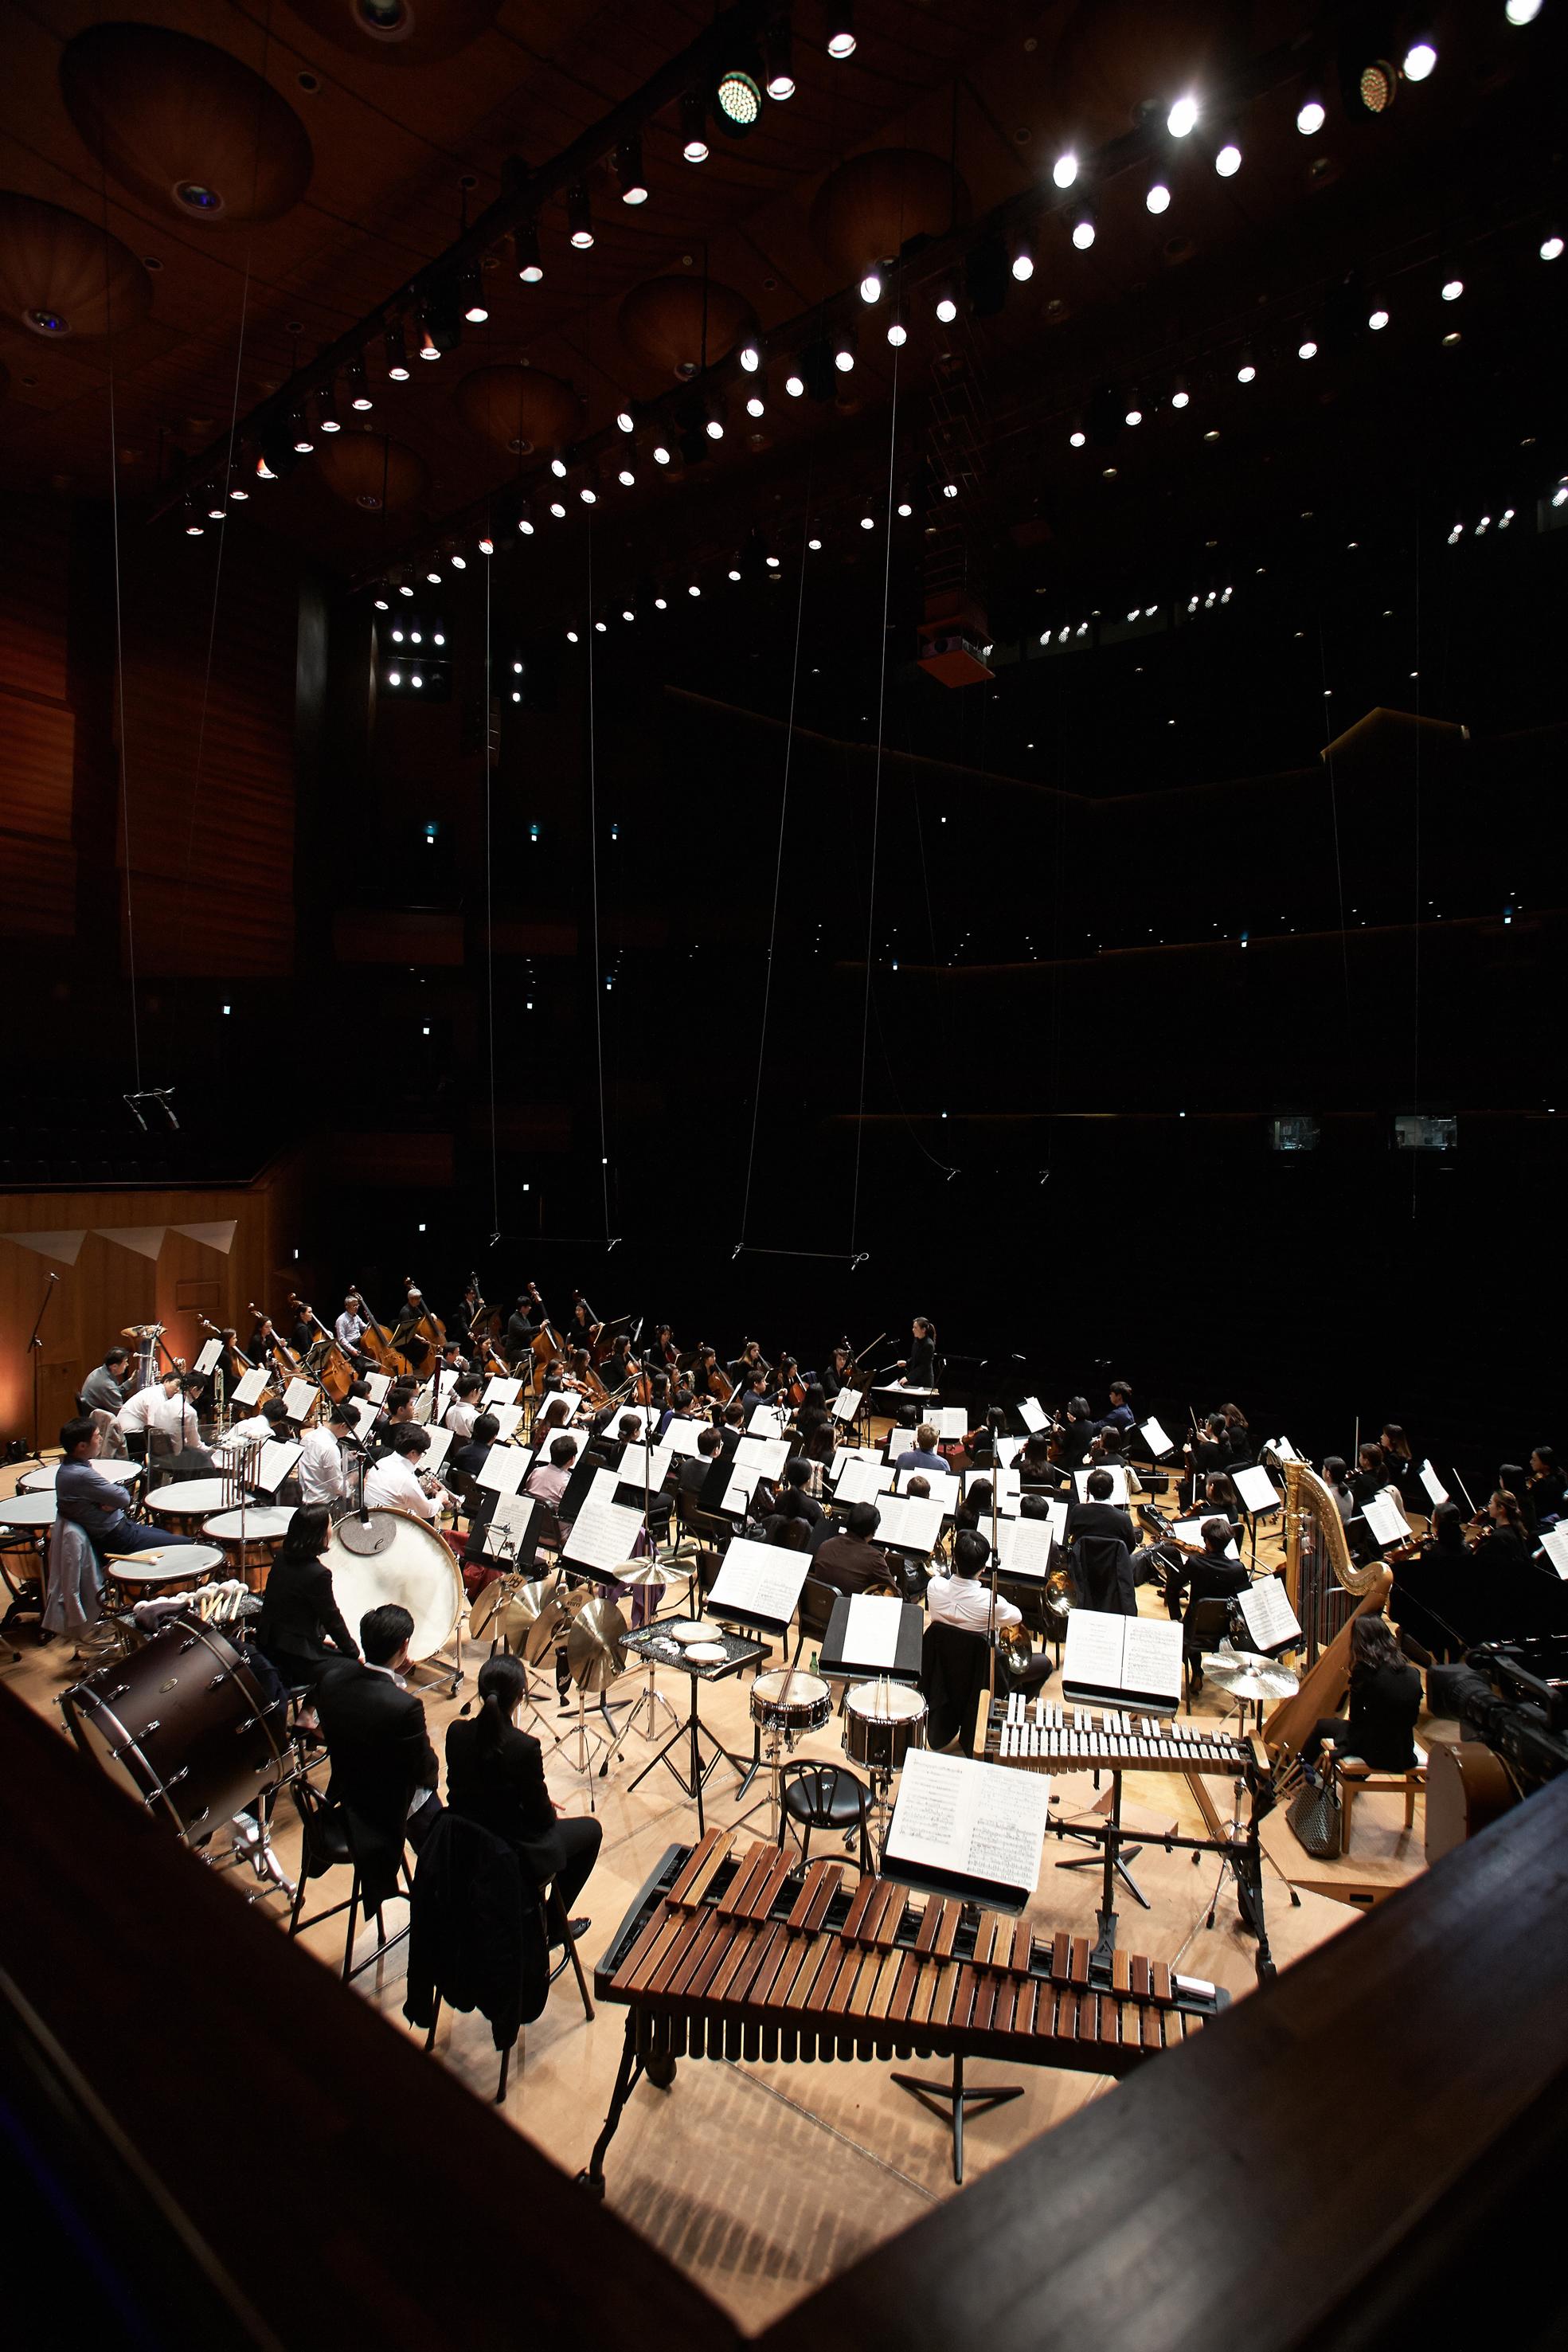 20150404 Cr sympony Gyeonggi Philharmonic 05.jpg